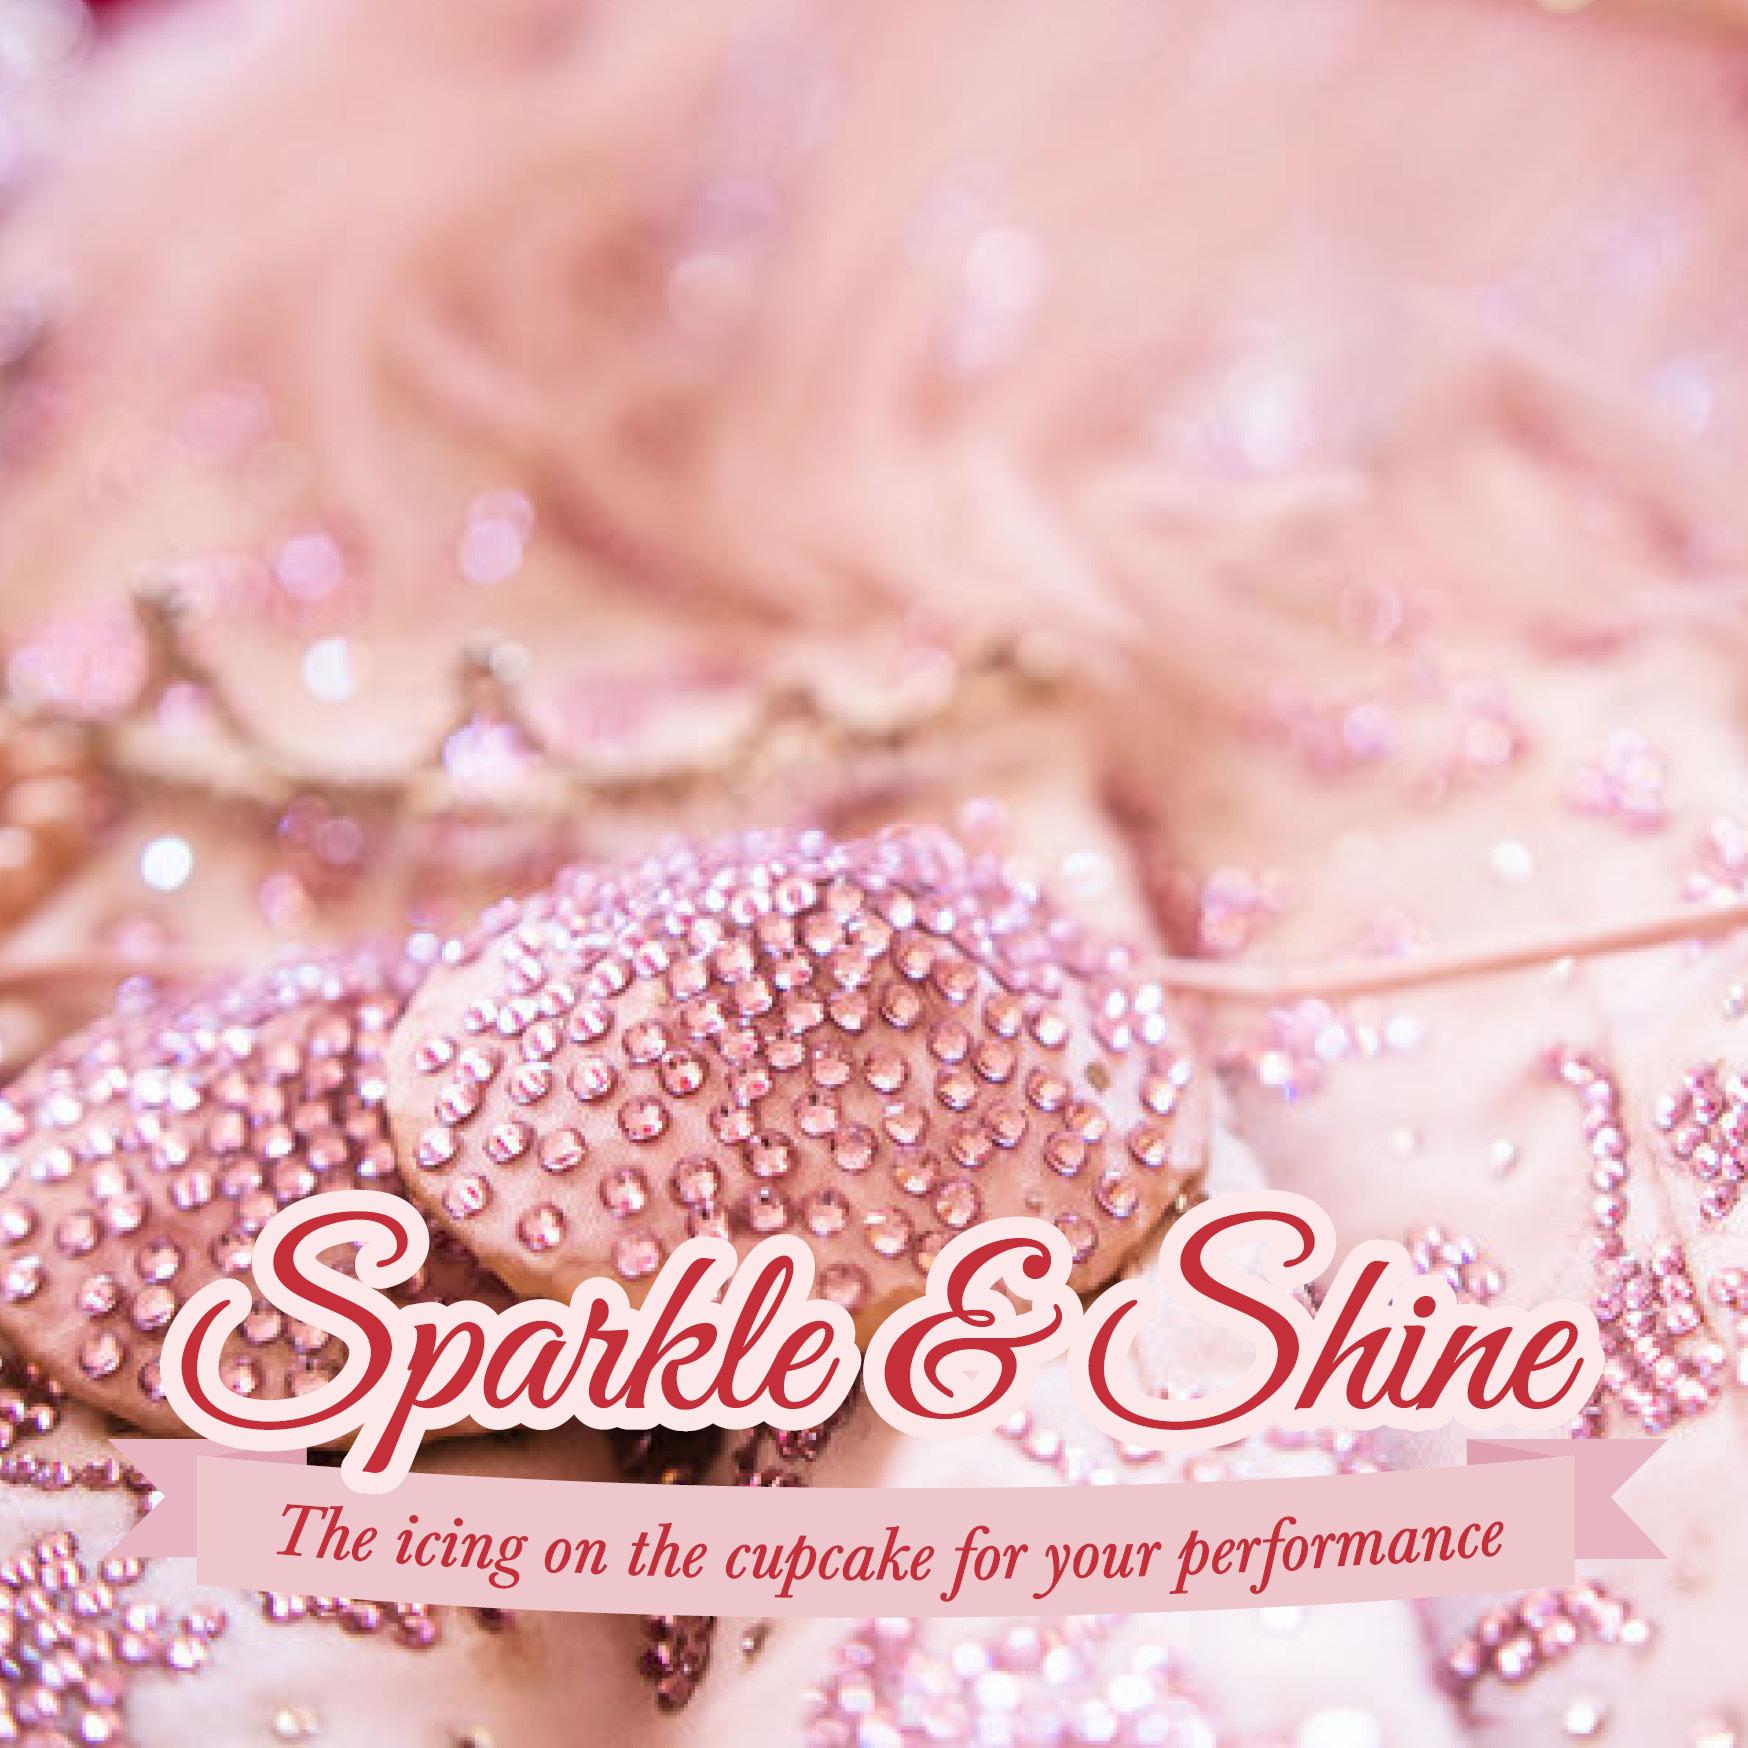 Sparkle-and-Shine.jpg